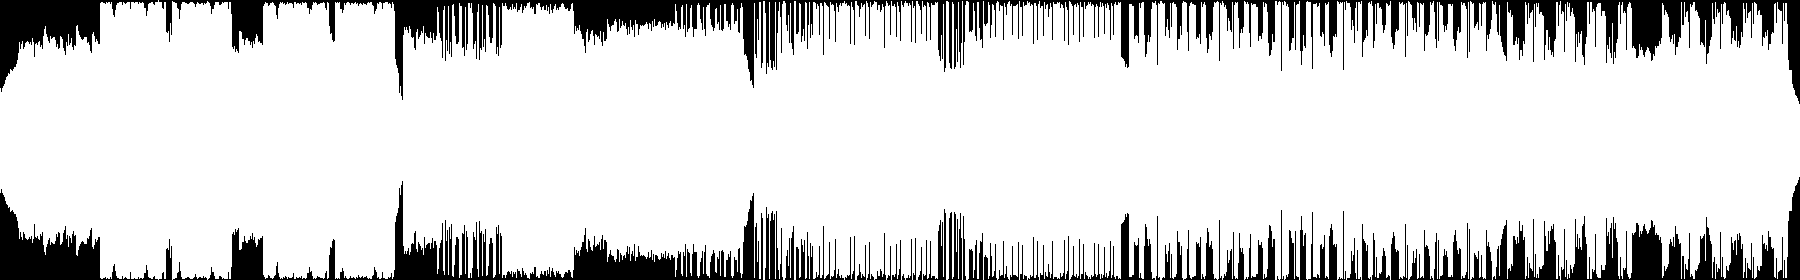 Gucci Thang audio waveform